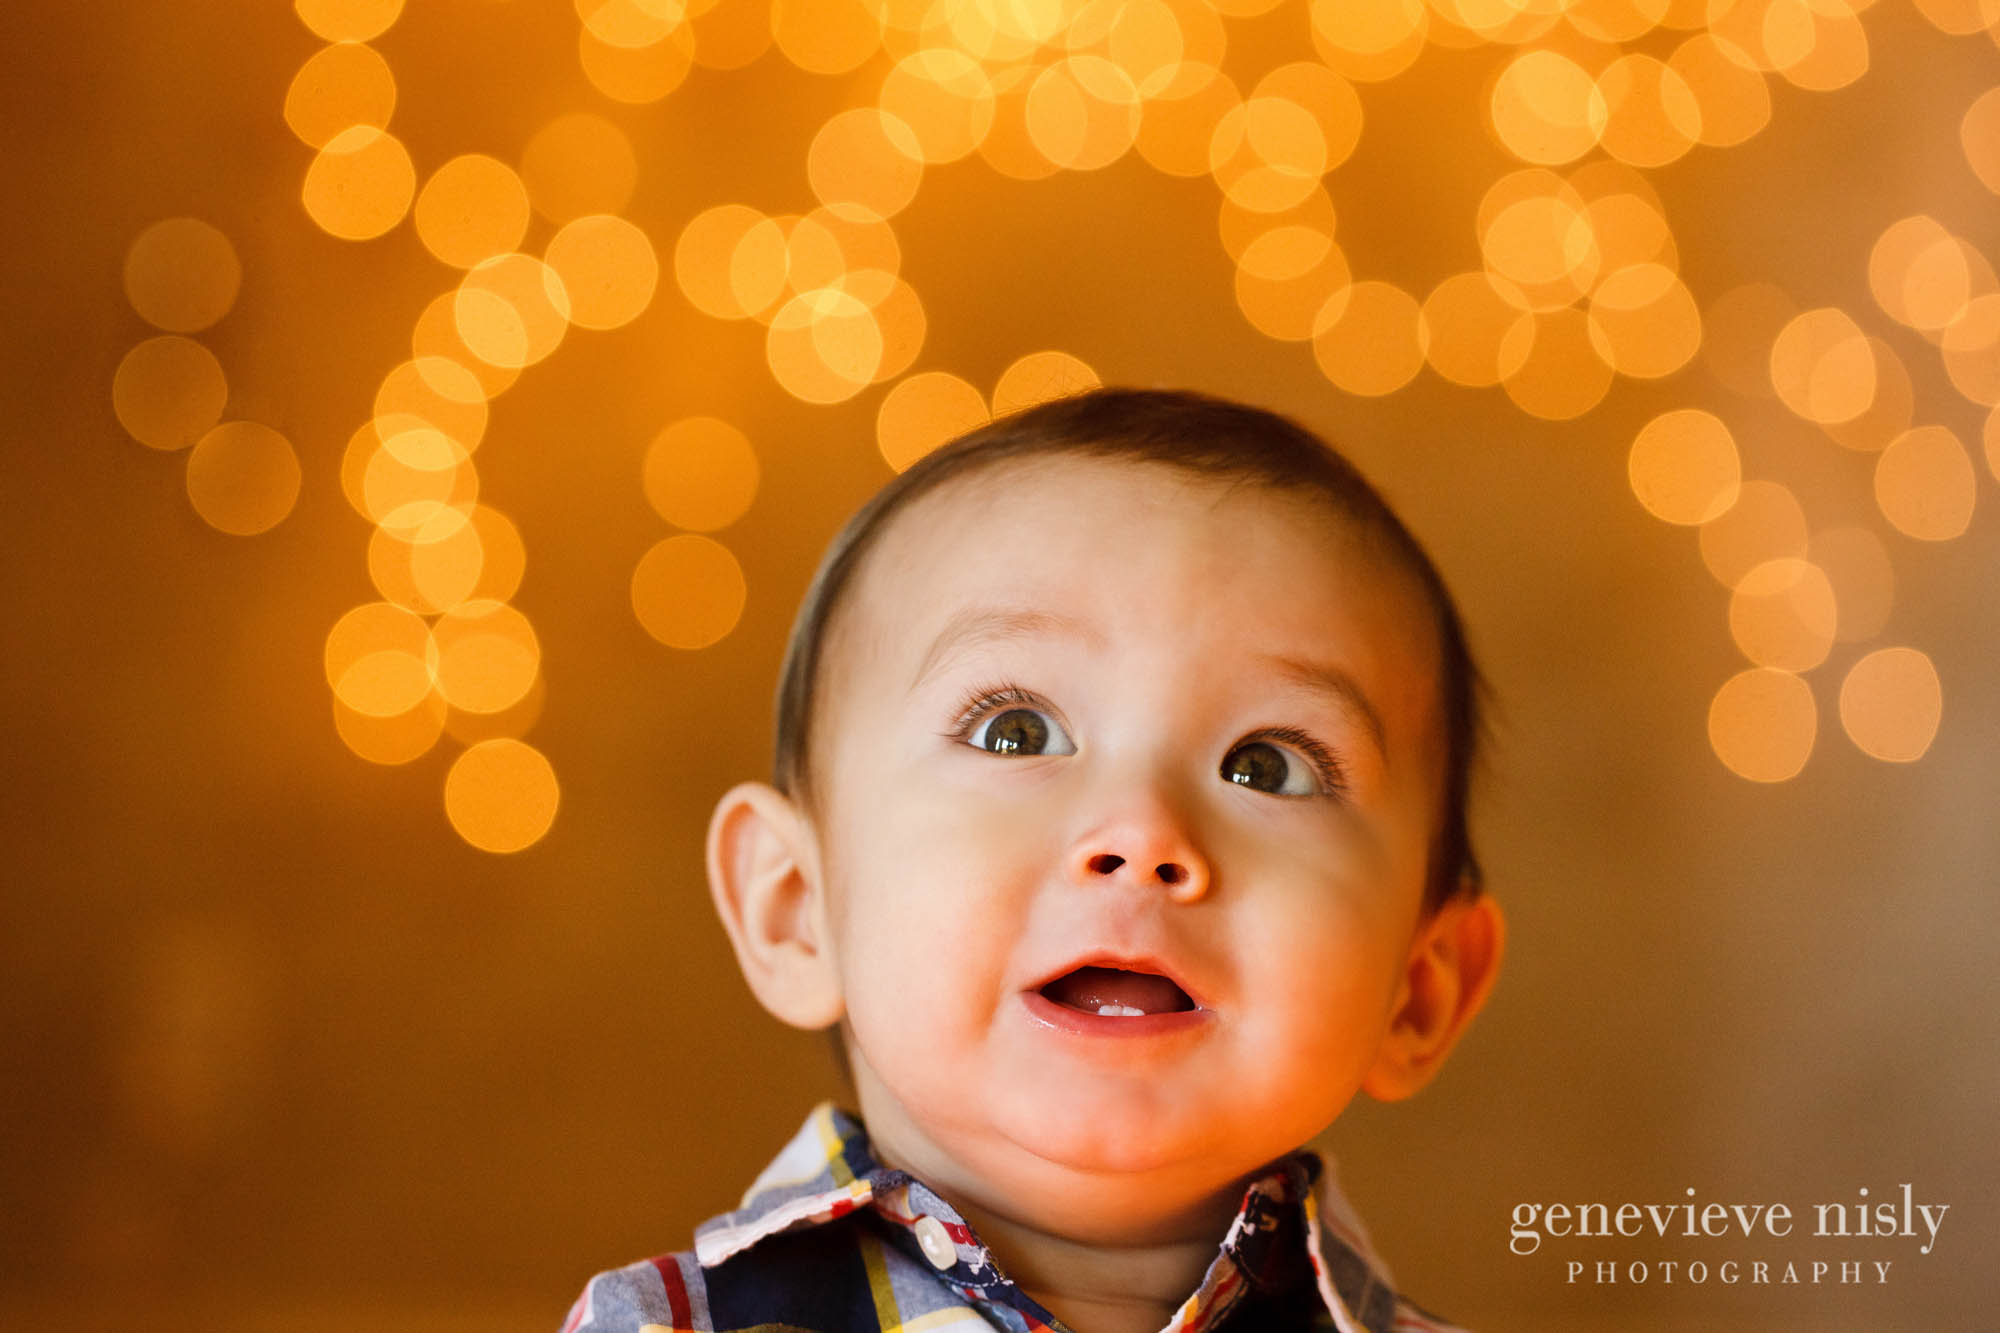 Copyright Genevieve Nisly Photography, Family, Kids, Portraits